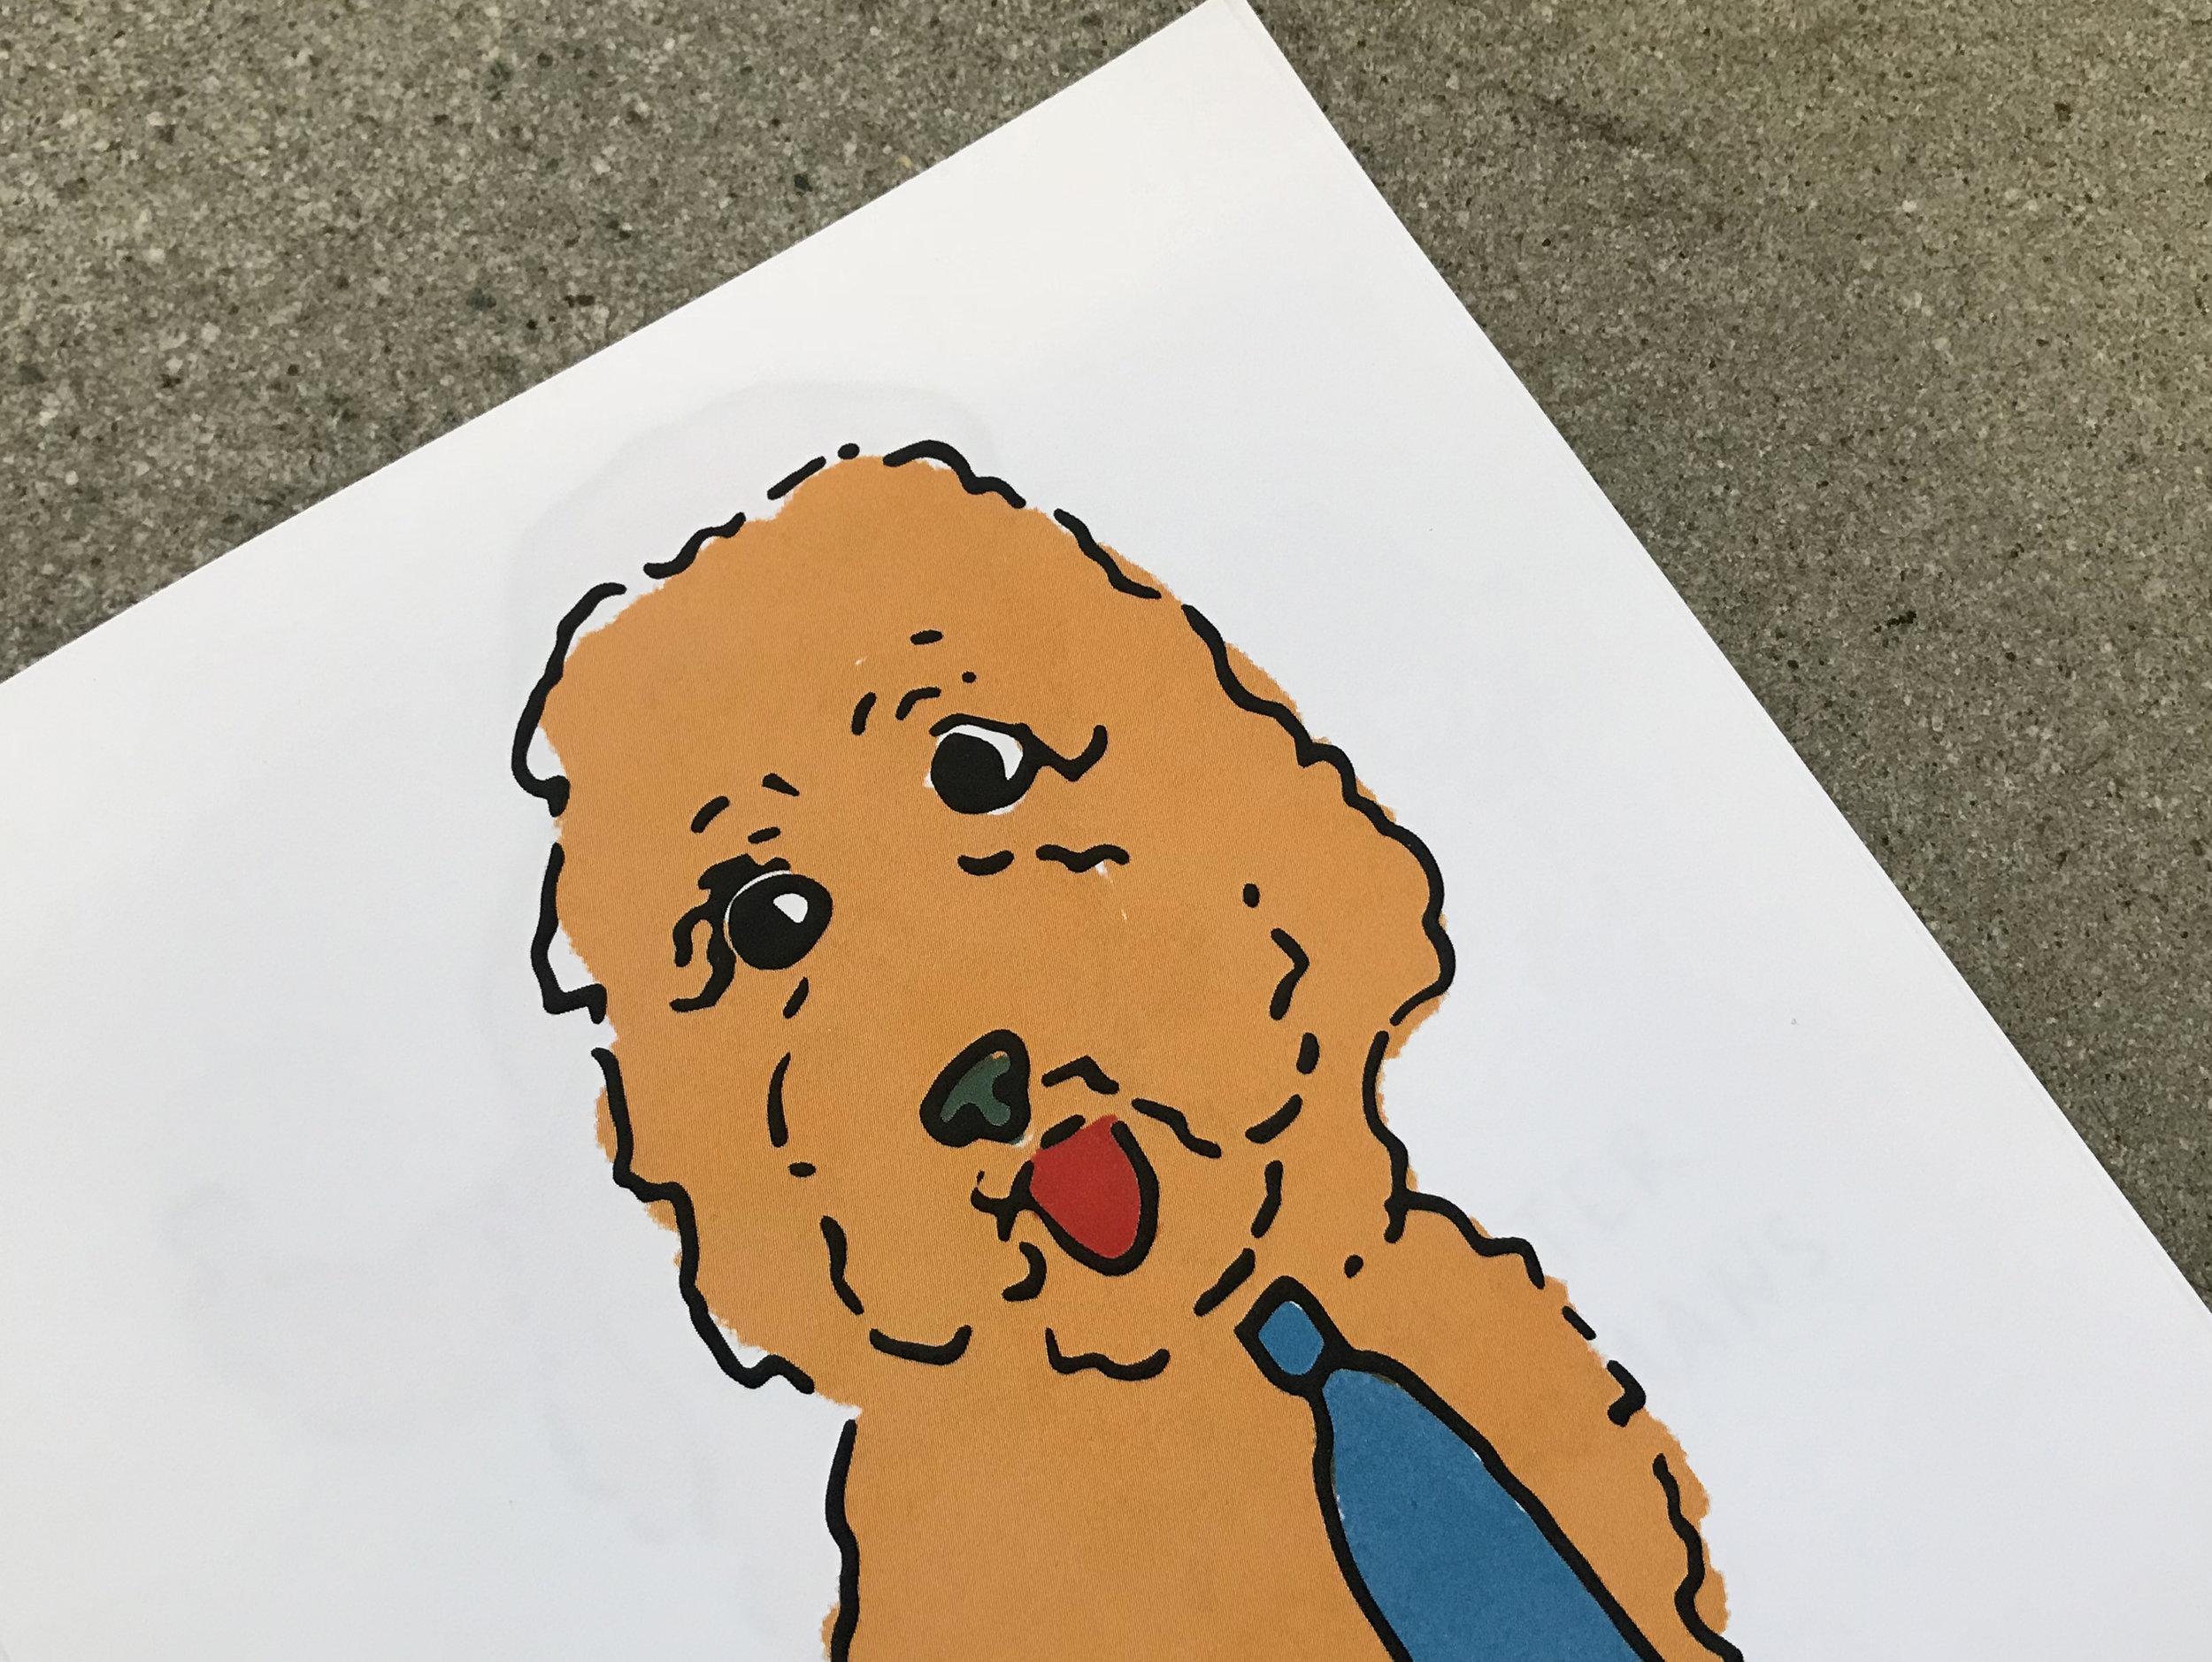 Dogs_0011_10.jpg